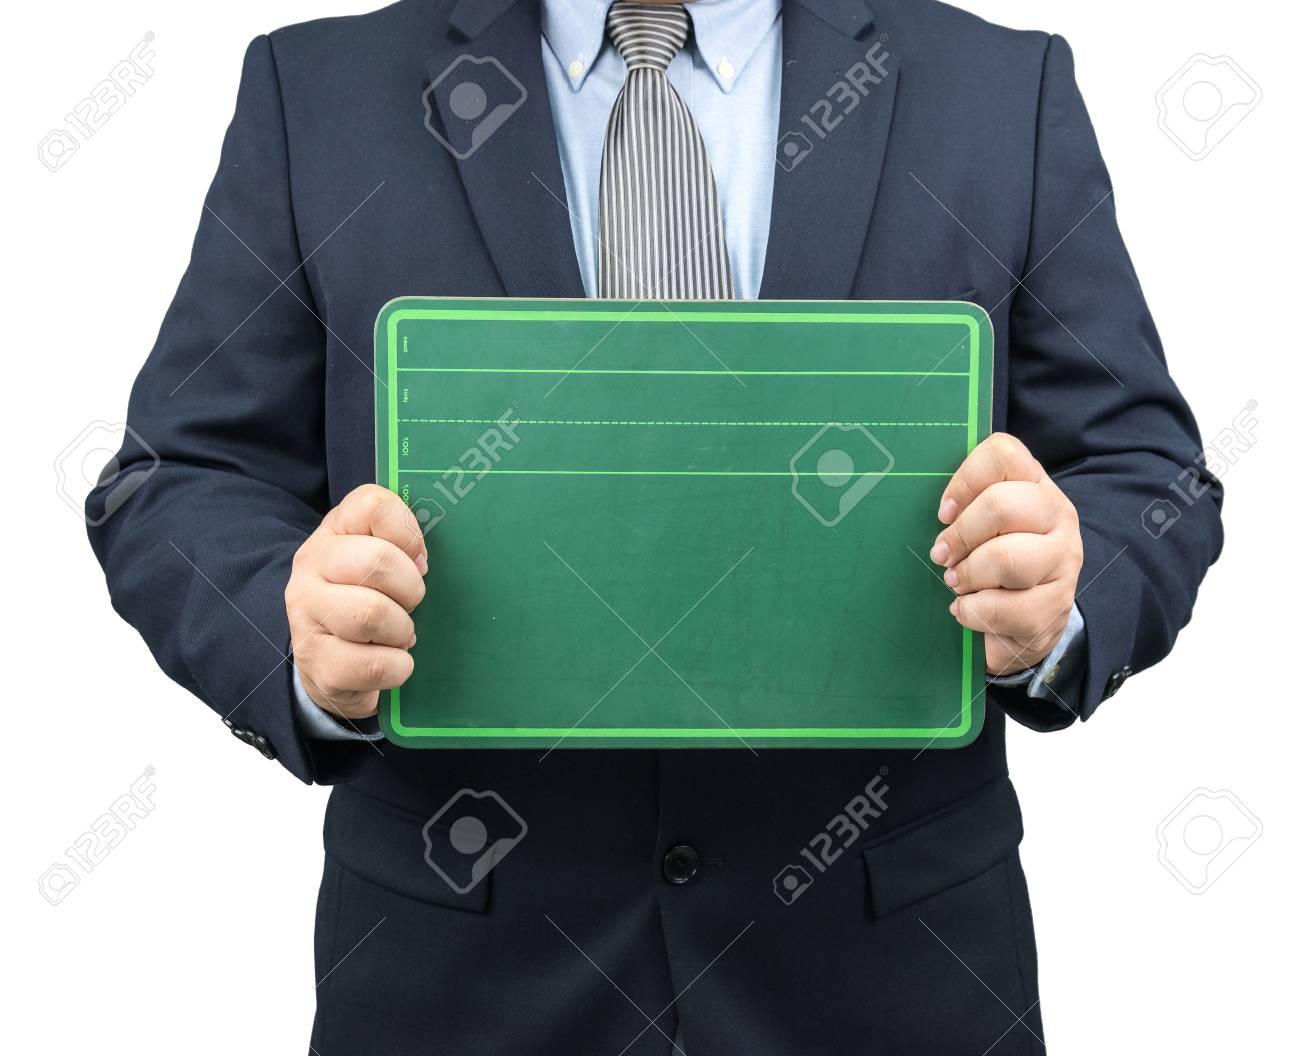 chock board